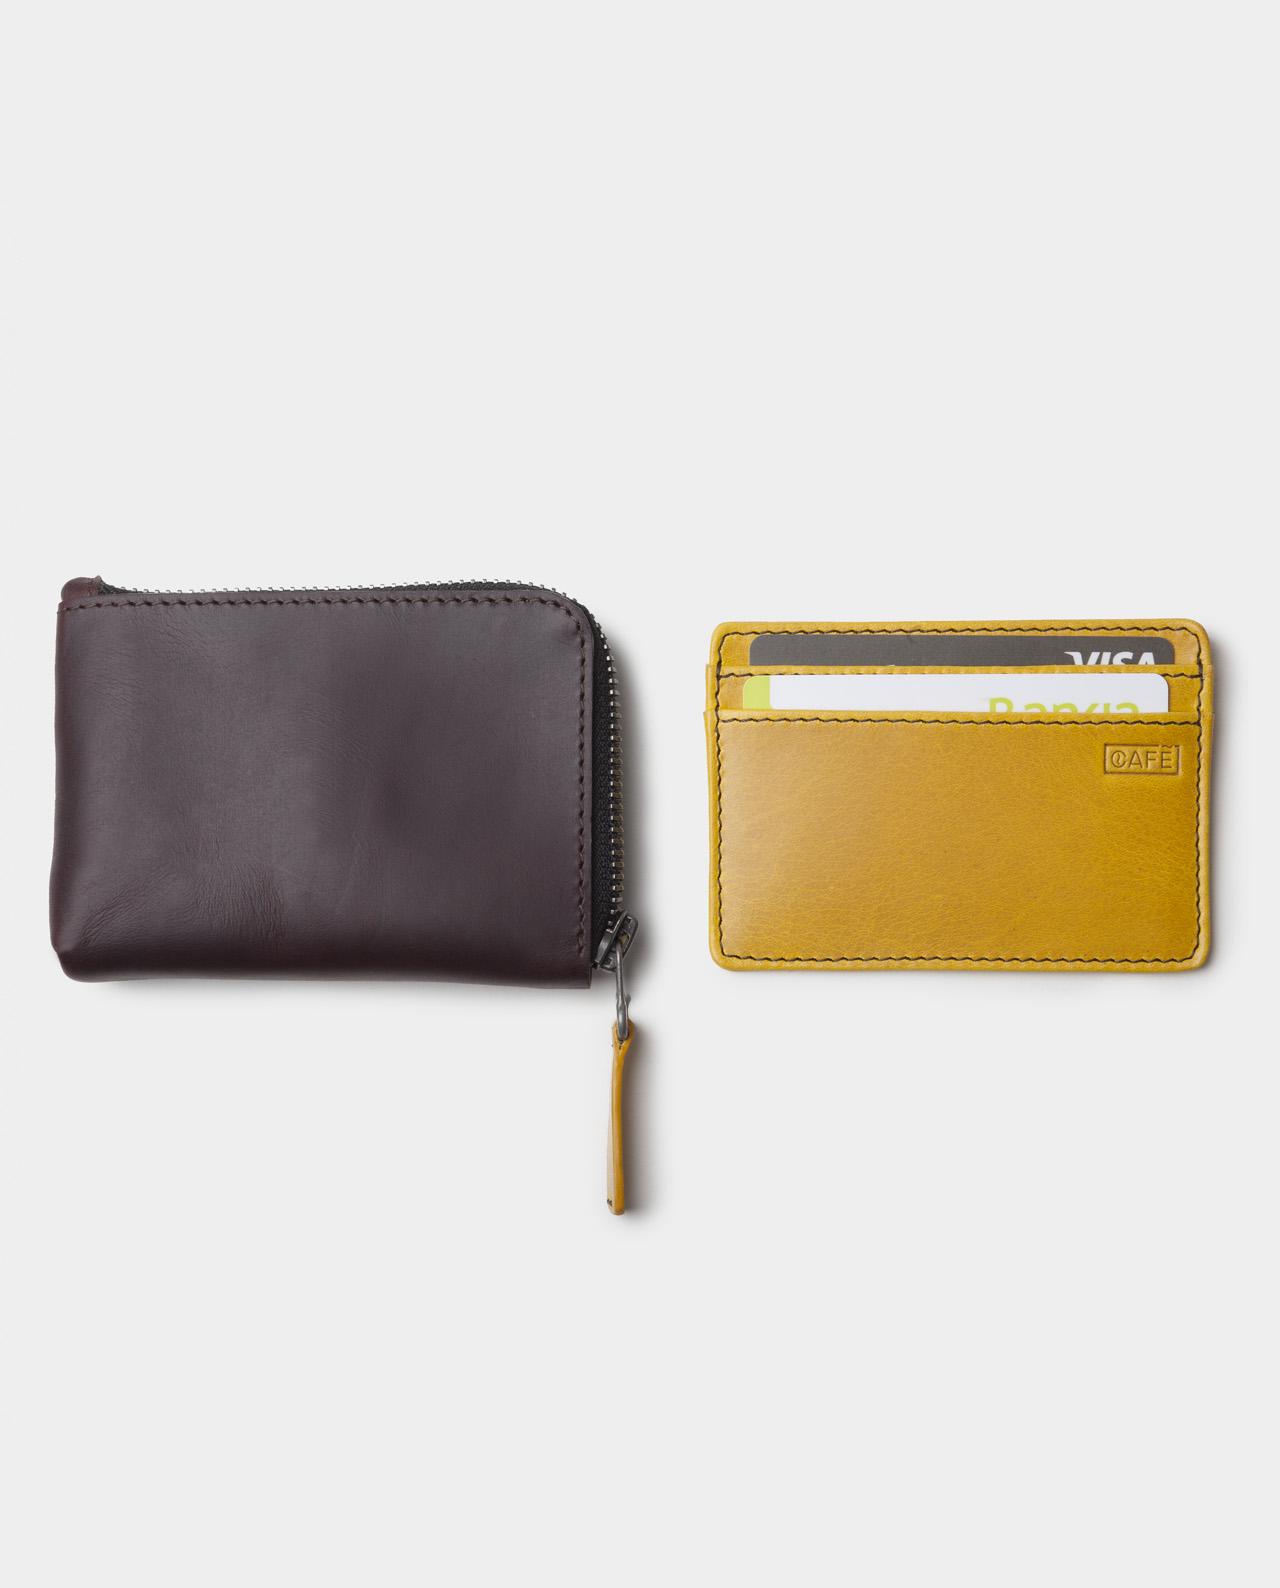 zip wallet with cardholder